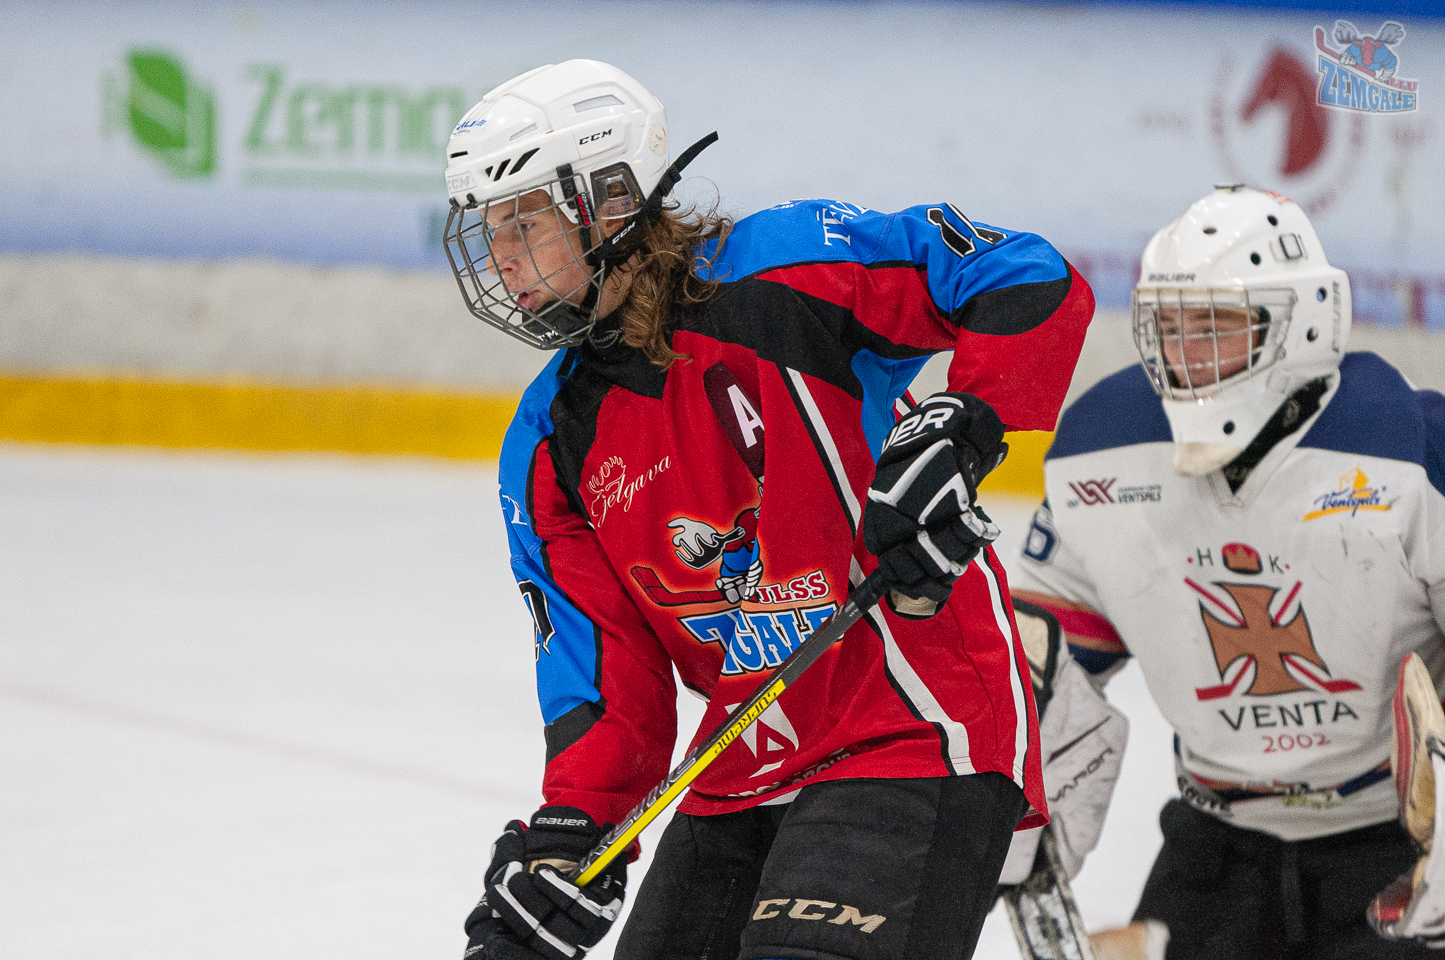 Jelgavas hokeja skola JLSS U17 - Venta 2002 14092019-09